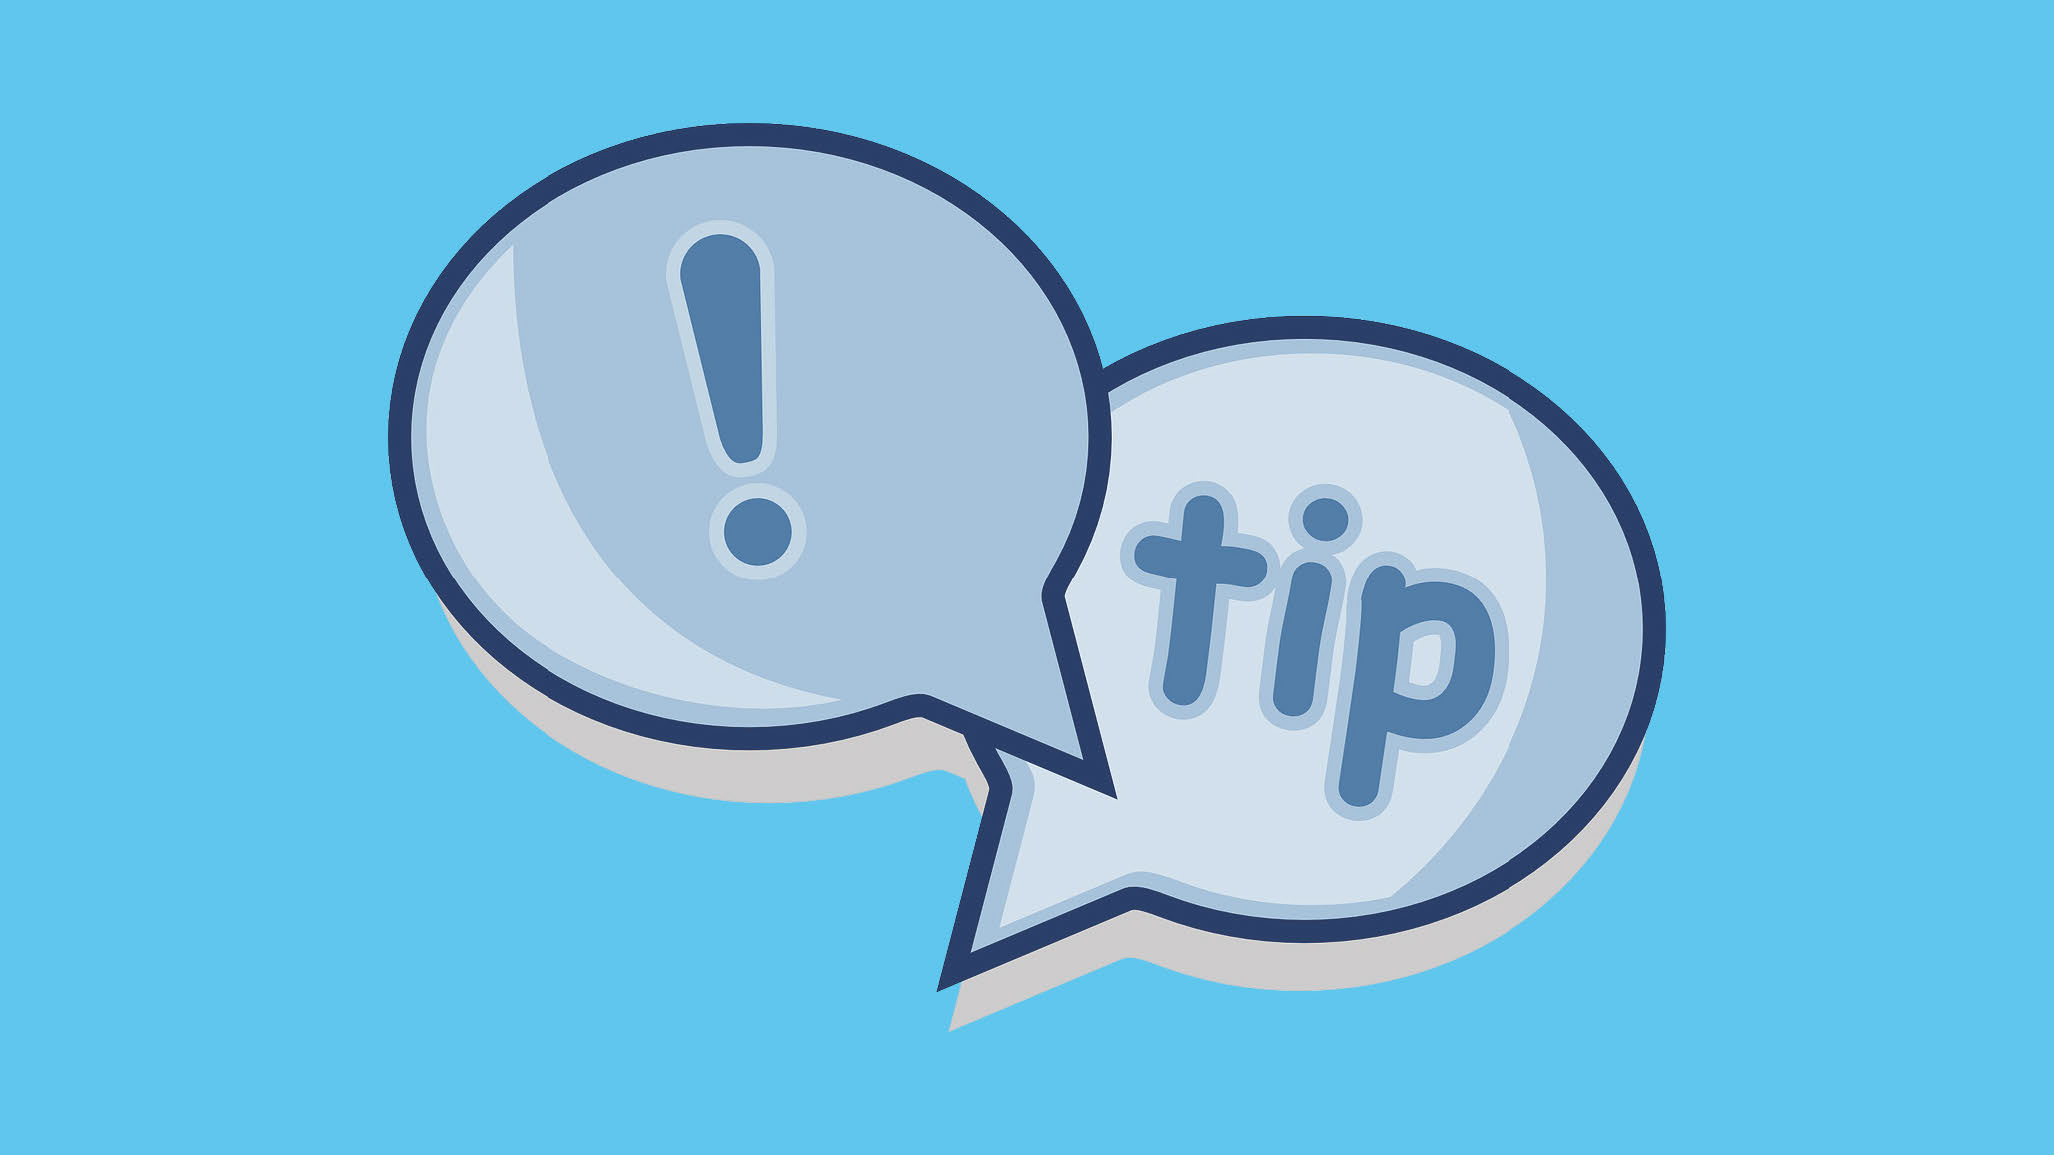 Support & Advice During the Coronavirus Outbreak